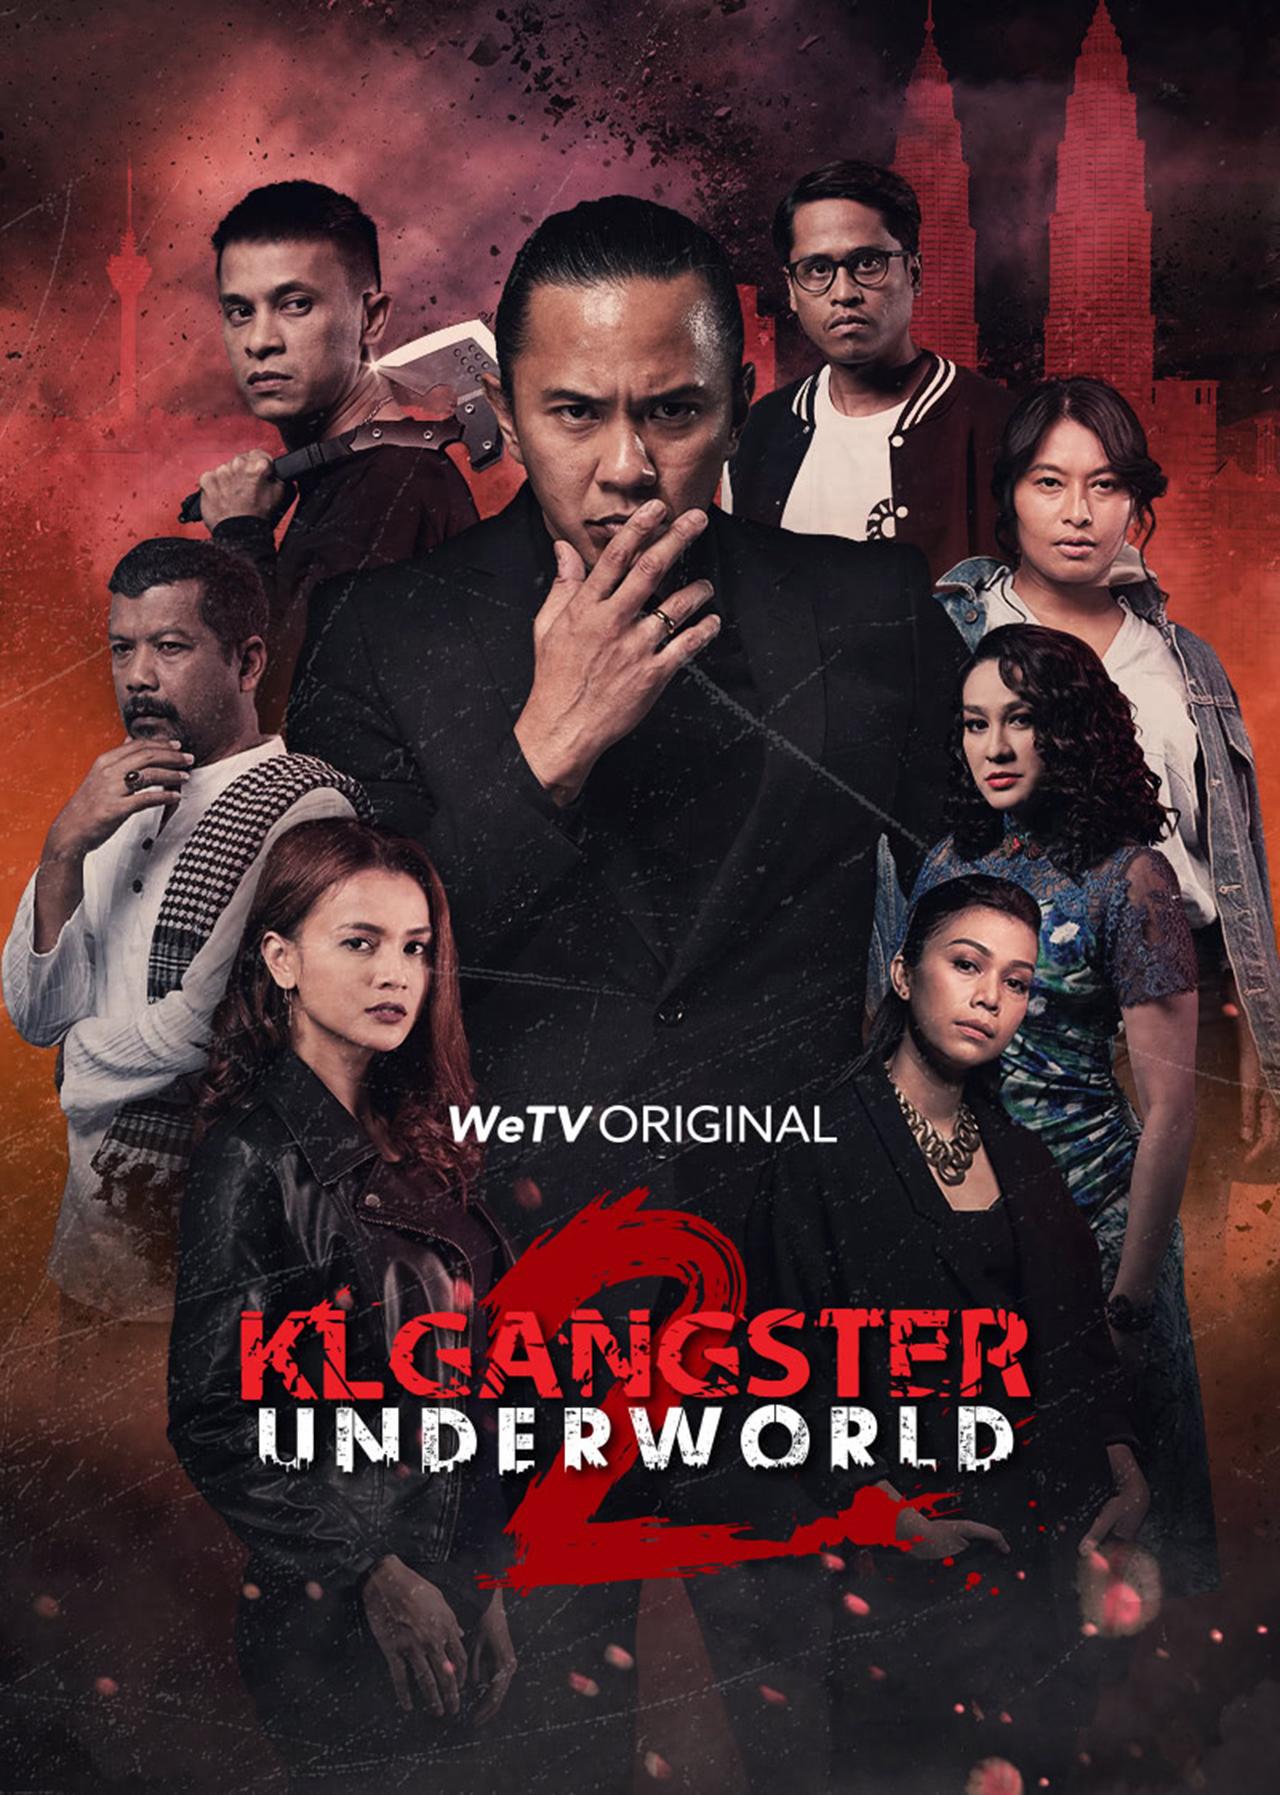 Drama KL Gangster Underworld 2